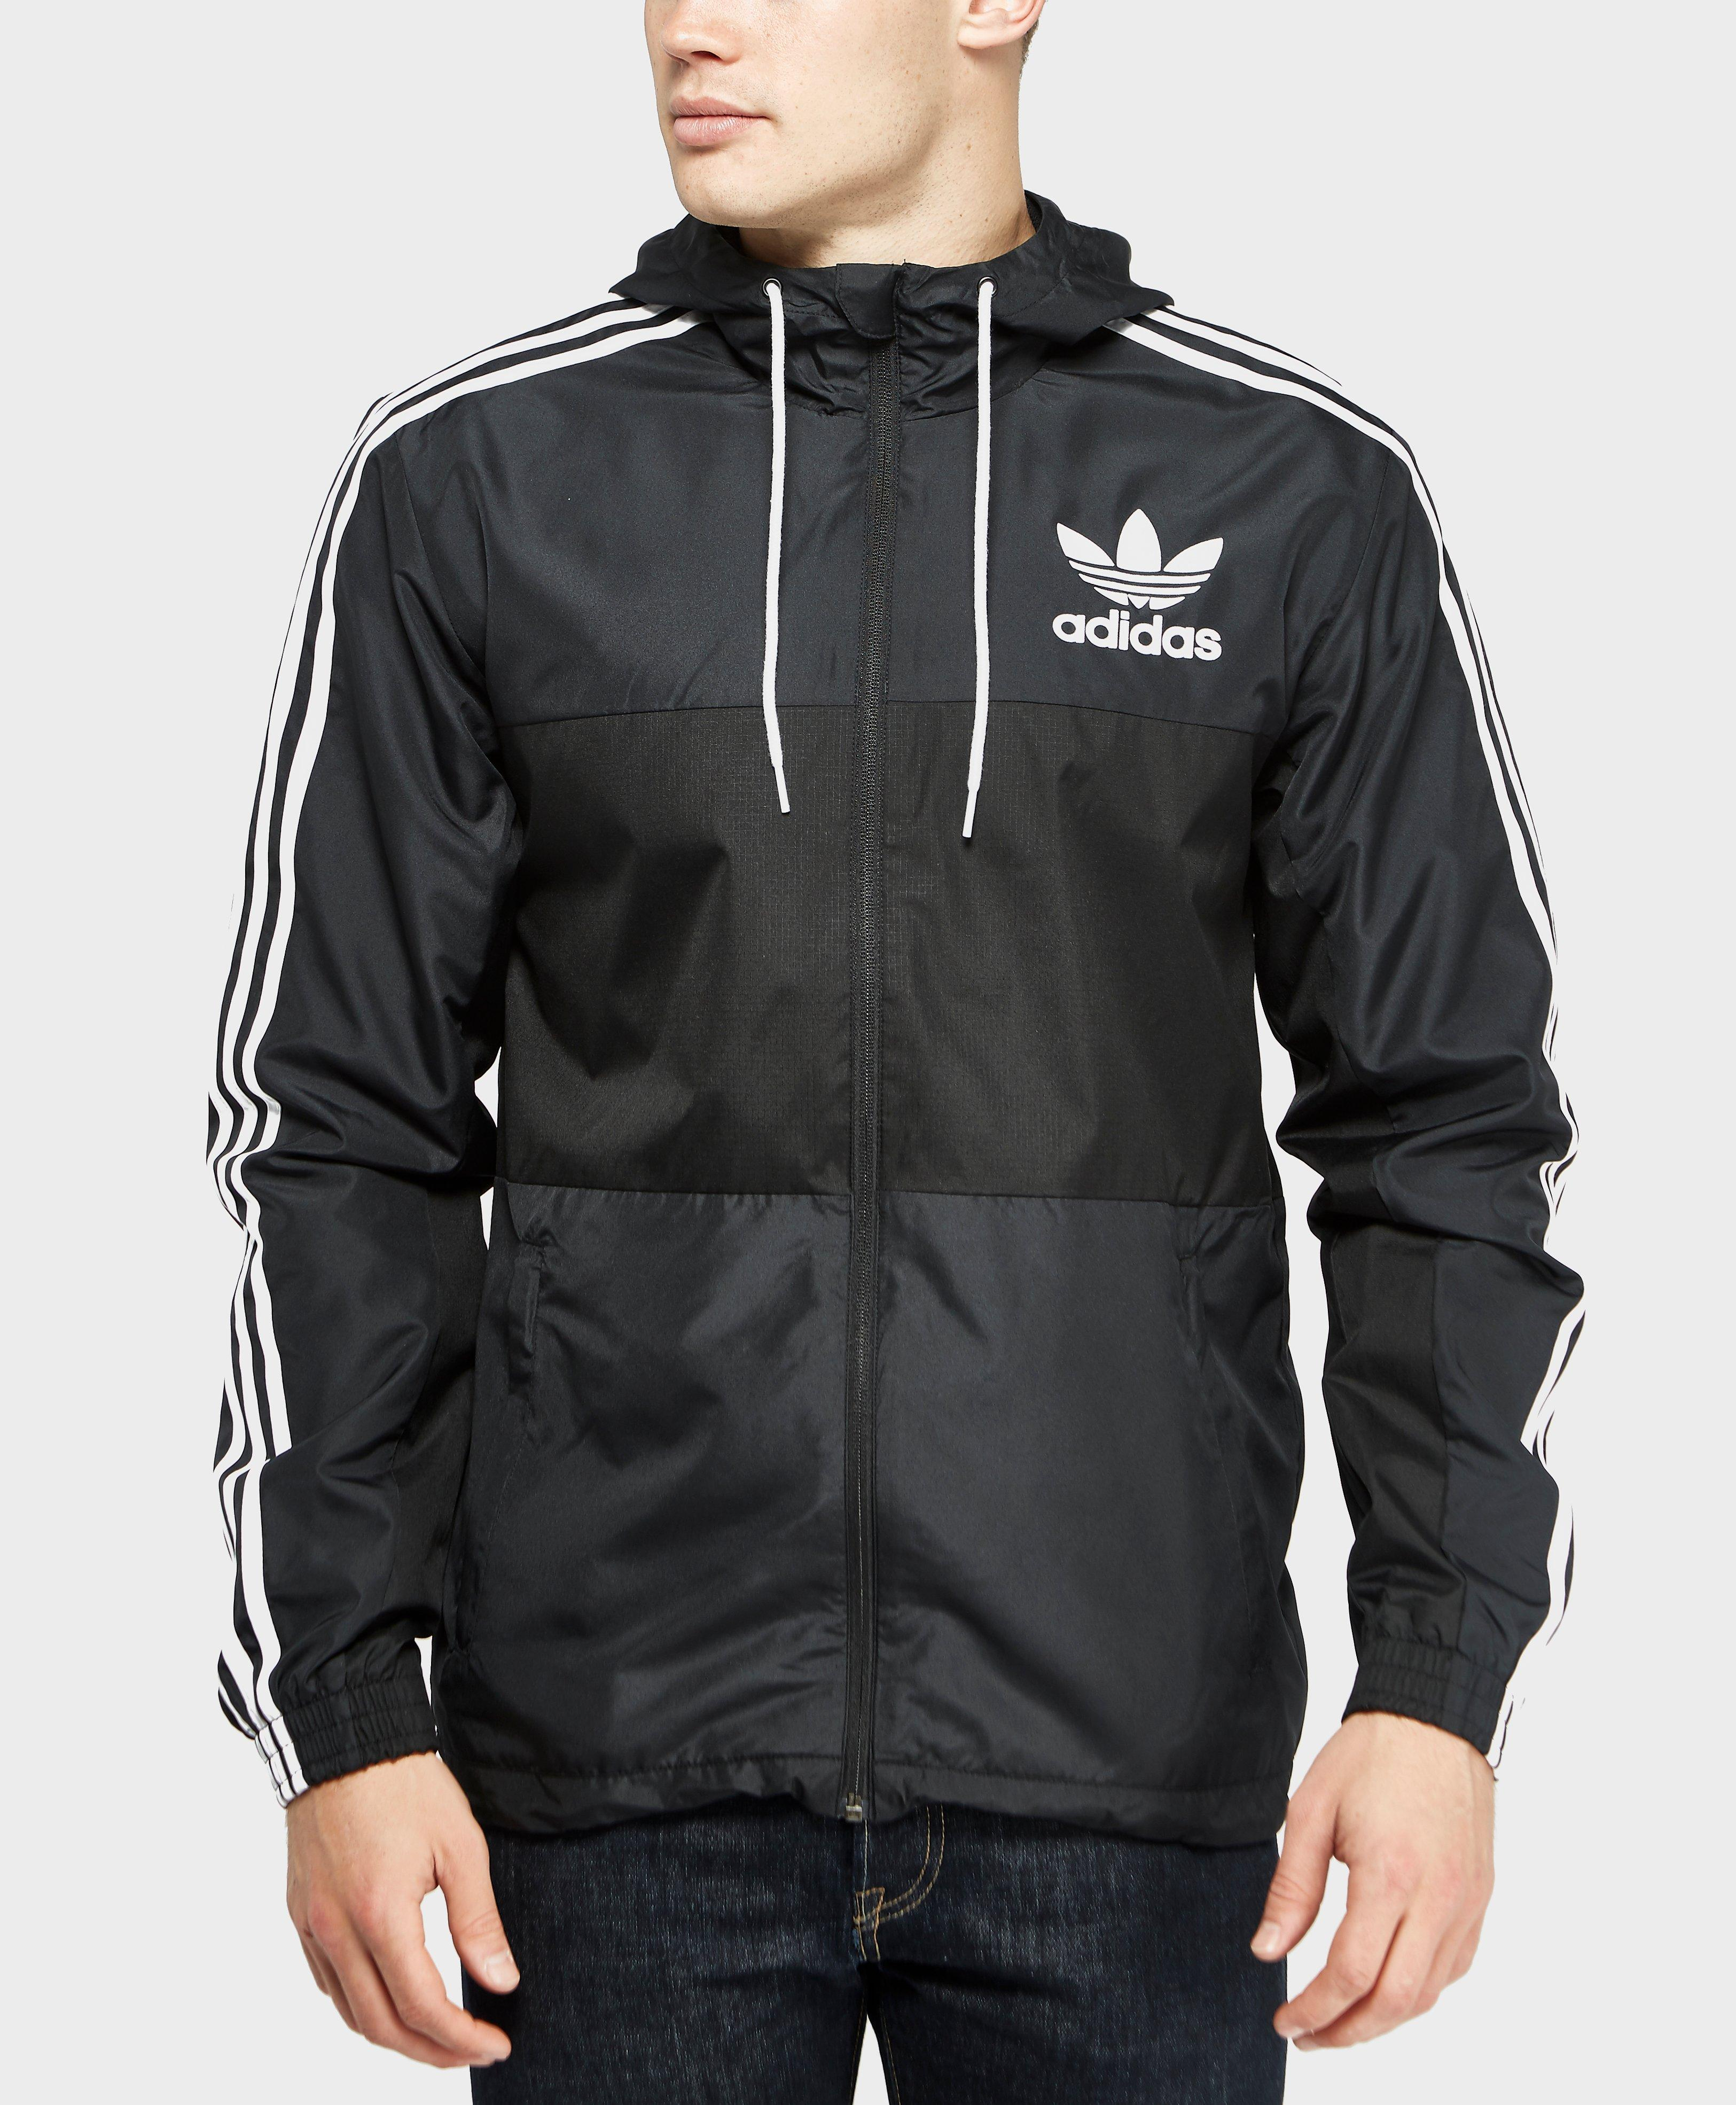 adidas windbreaker adidas originals california windbreaker jacket ... ZLROCKA